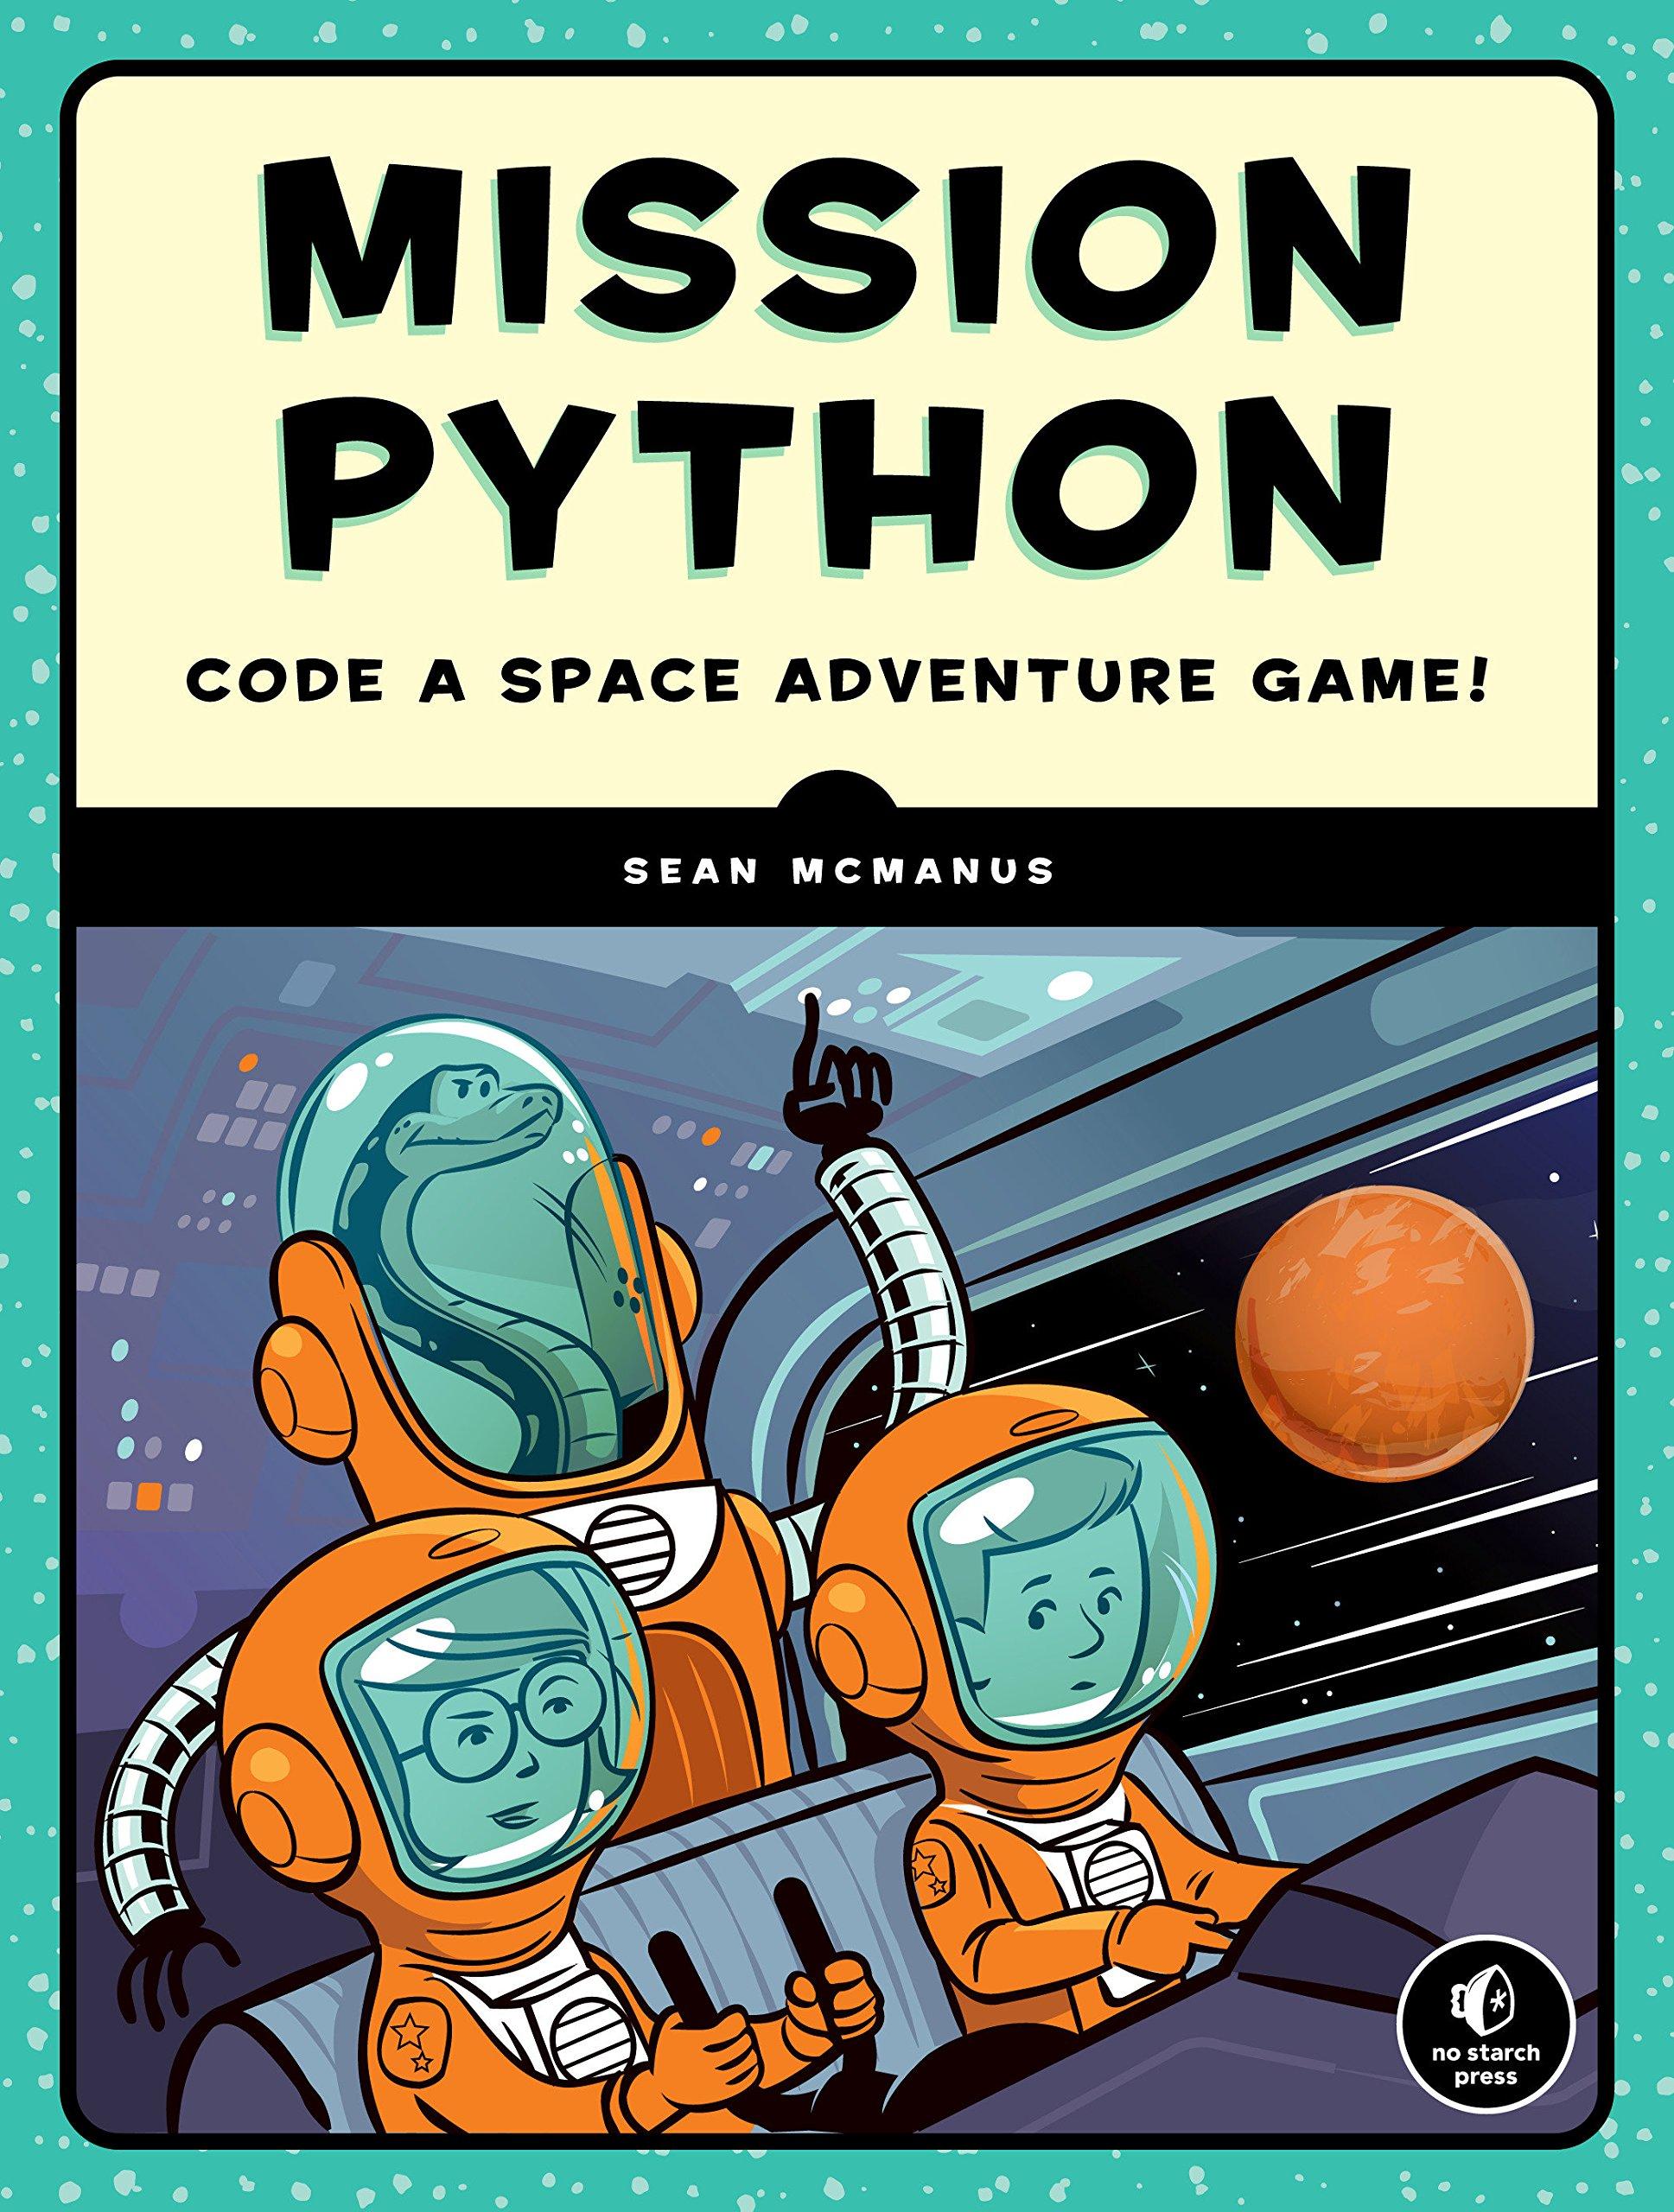 Mission Python: Code a Space Adventure Game!: Sean McManus